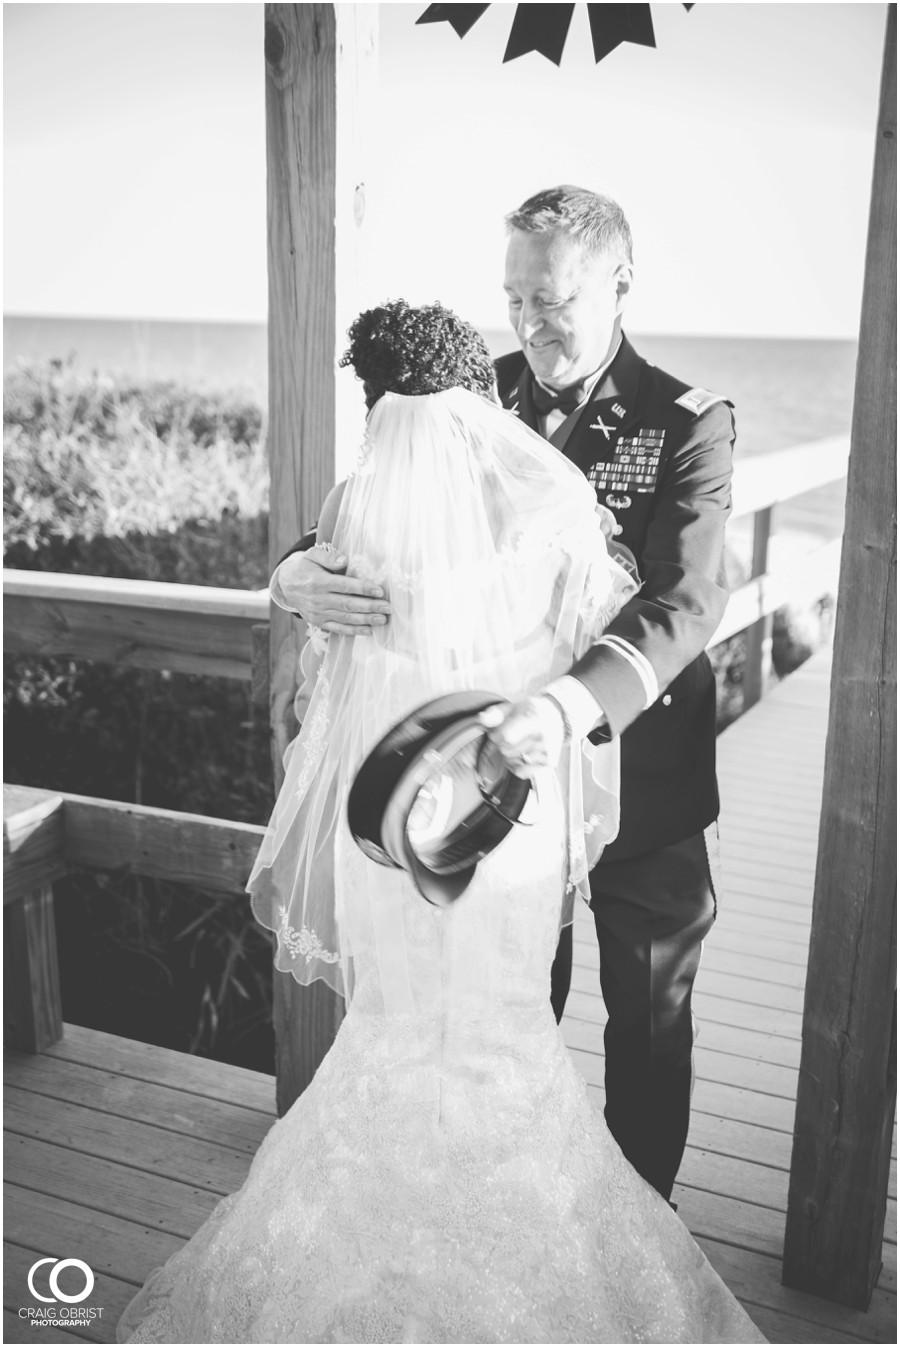 Seaside-30A-Beachside-Wedding-Sunset-Santa-Rosa-Photographer_0081.jpg